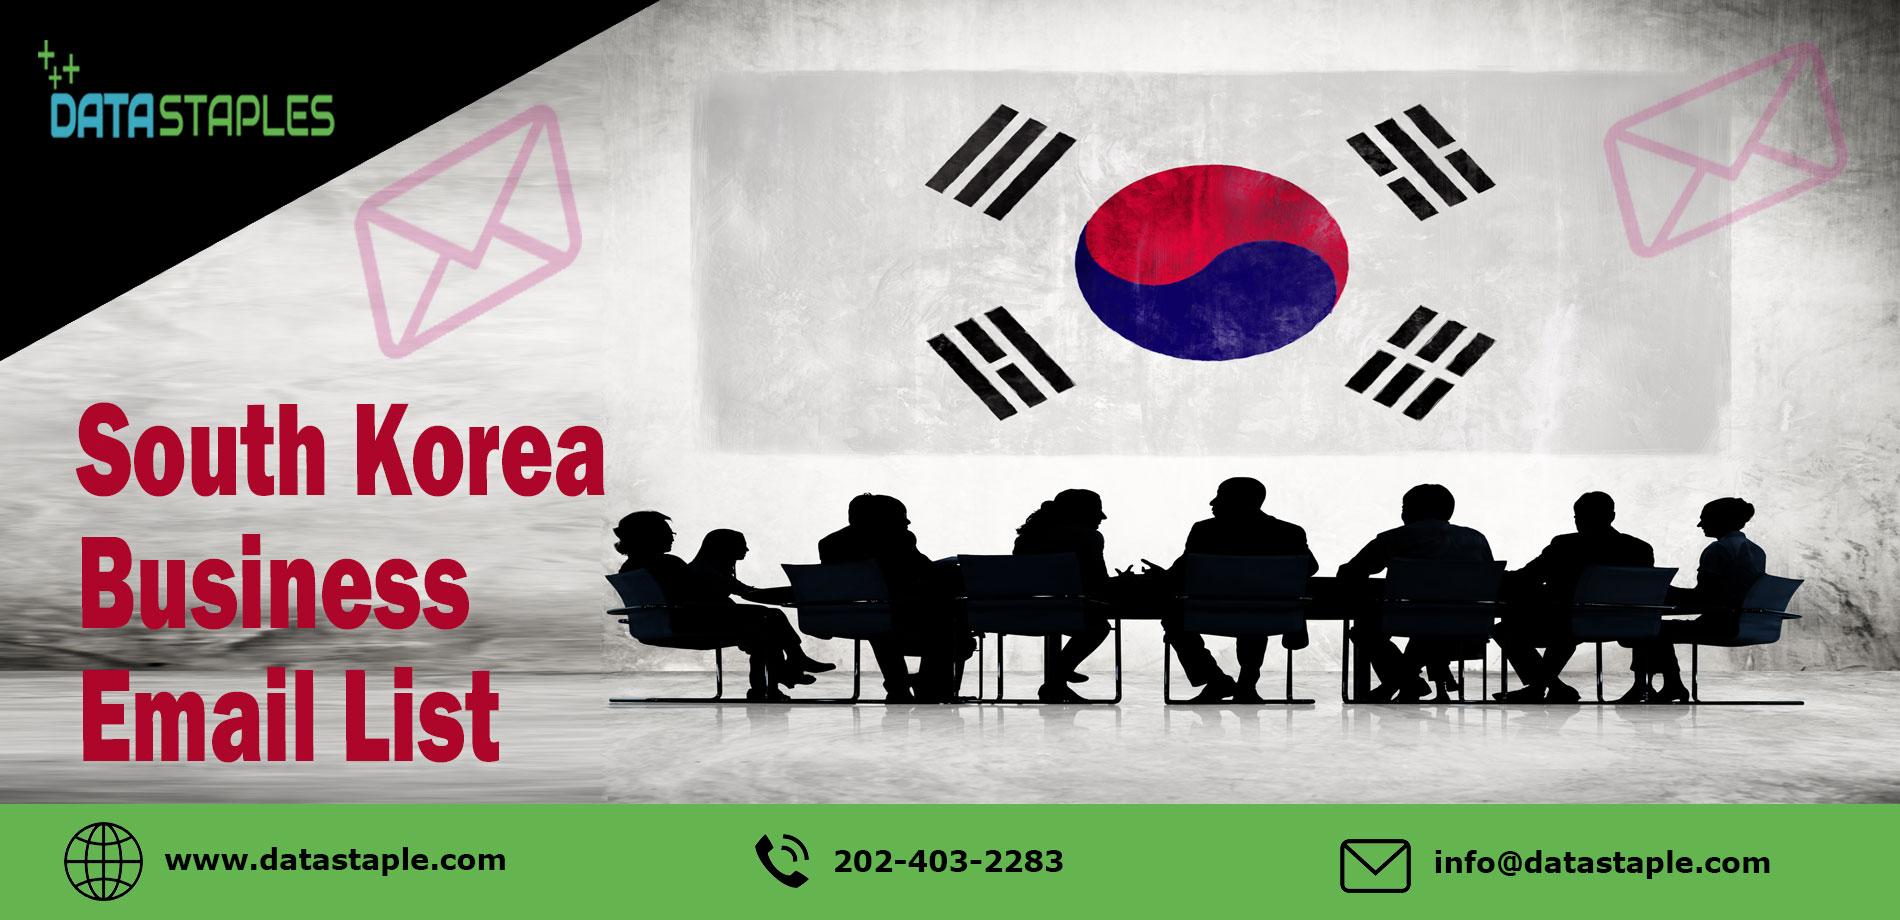 South Korea Business Email List | DataStaples